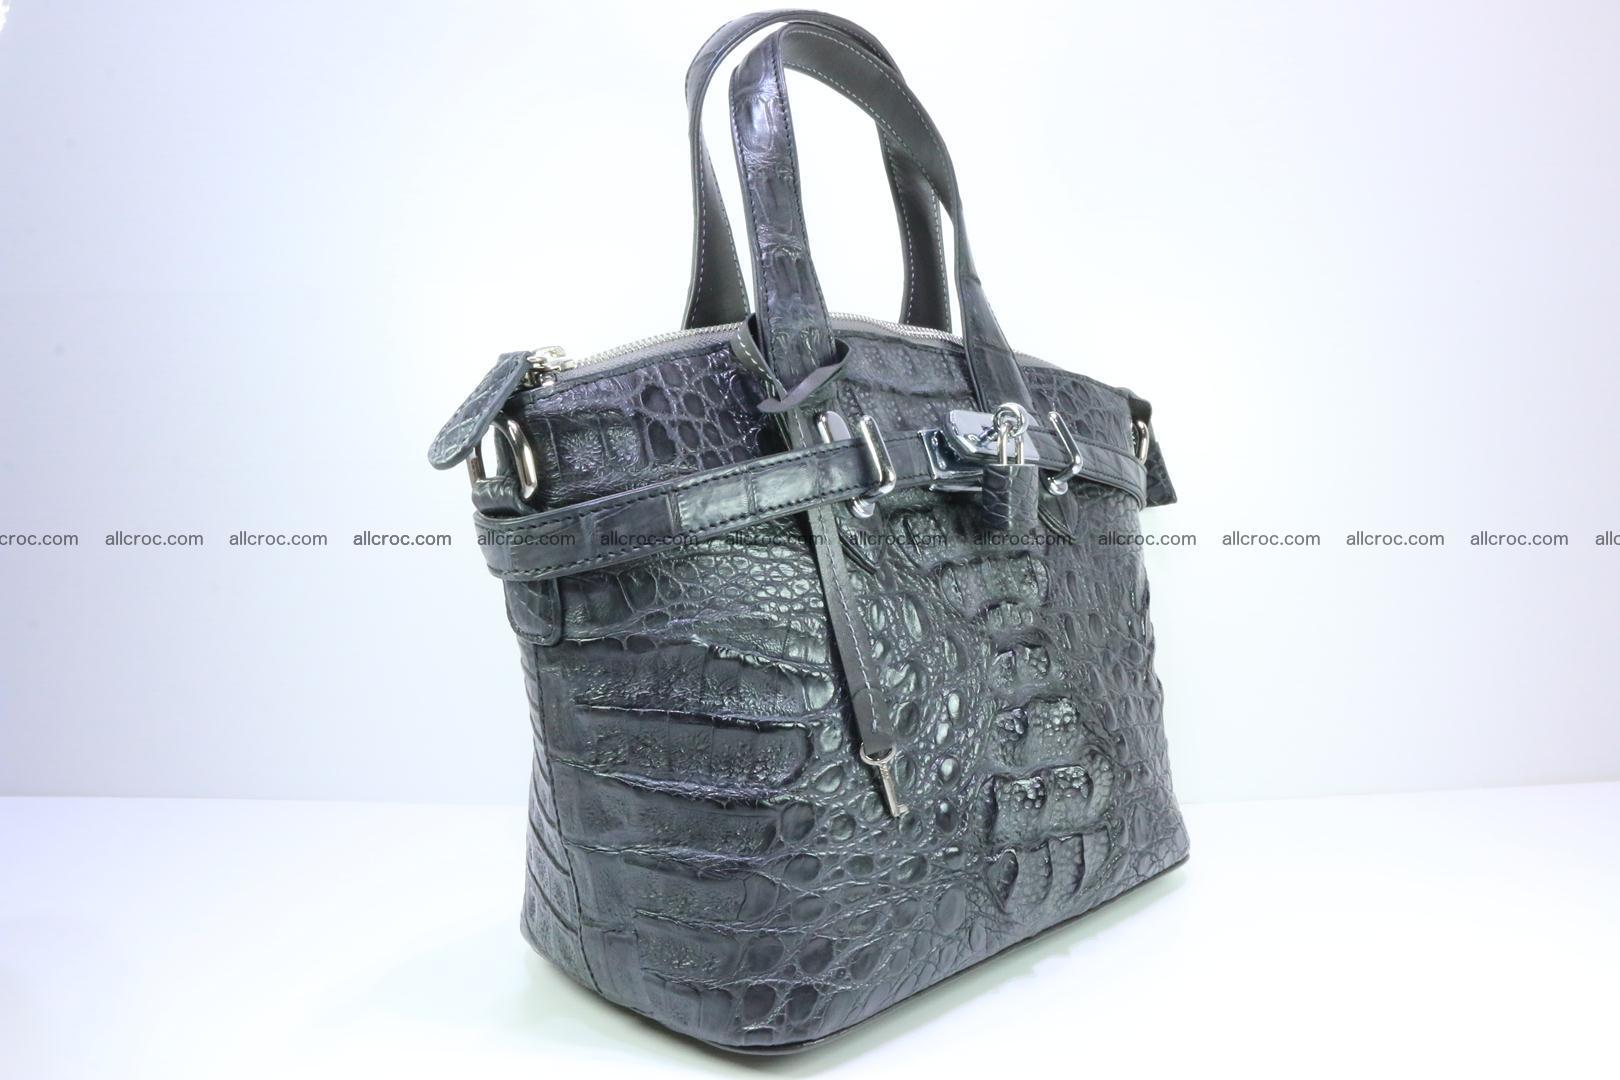 Genuine crocodile handbag for ladies 049 Foto 1